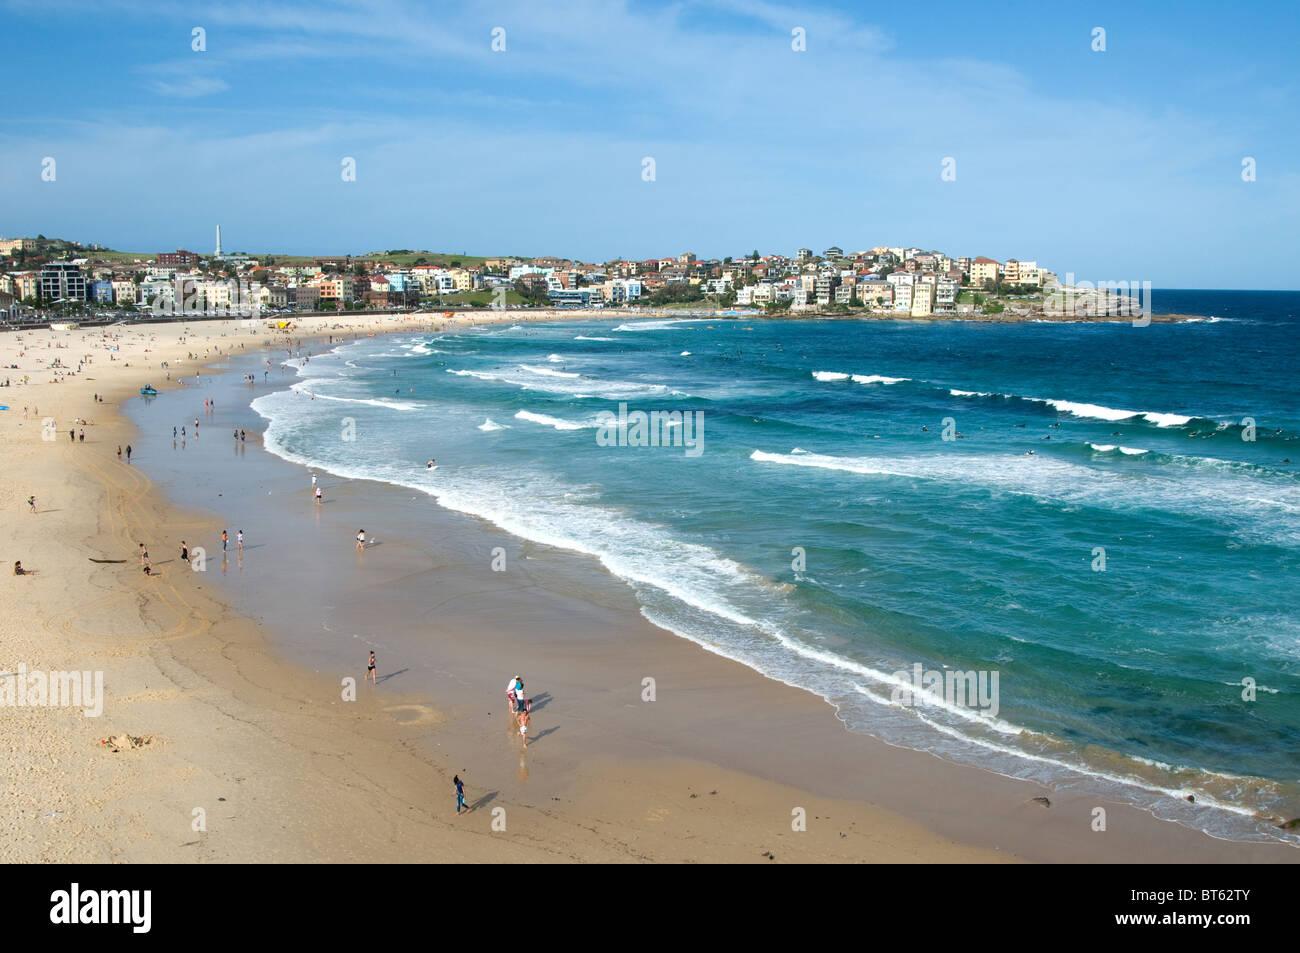 4e4f1b4e420024 bondi beach sydney australia aussie surf surfer wave blue sea board walking  out big wet suit sunny day blue sky sun bathing sand